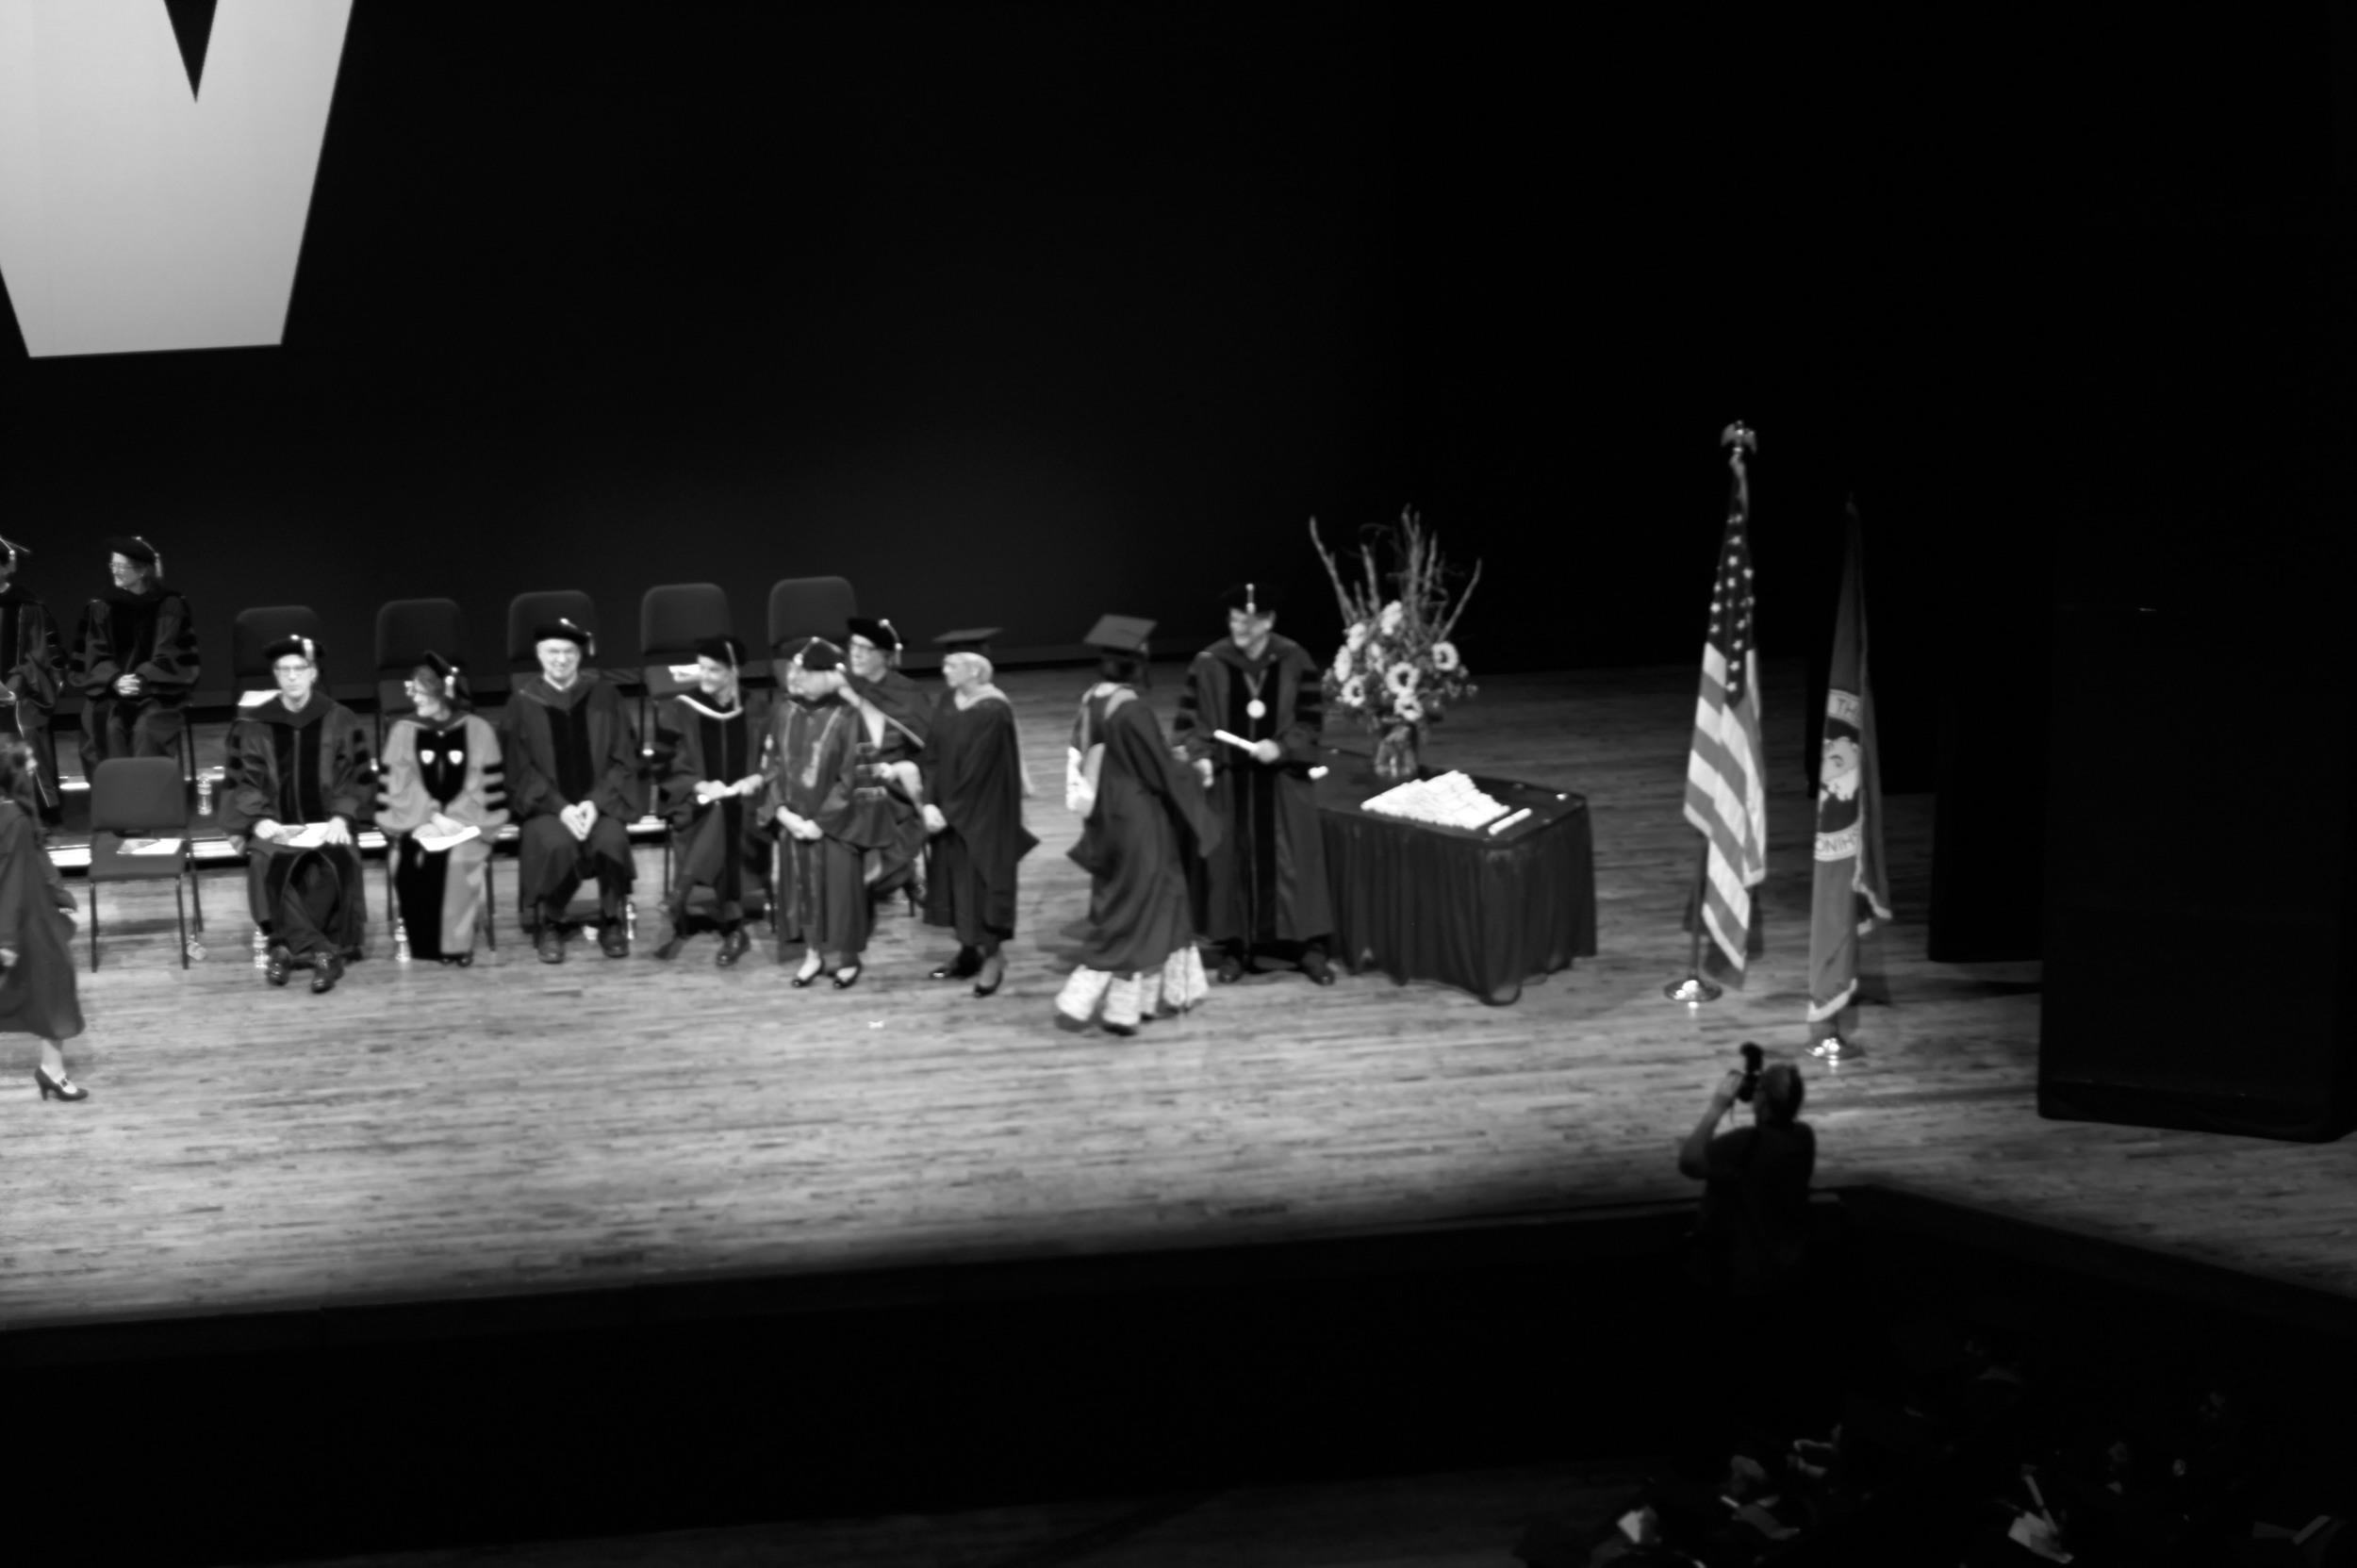 20140612_m9_EvansSchool_Graduation_008_BW.jpg